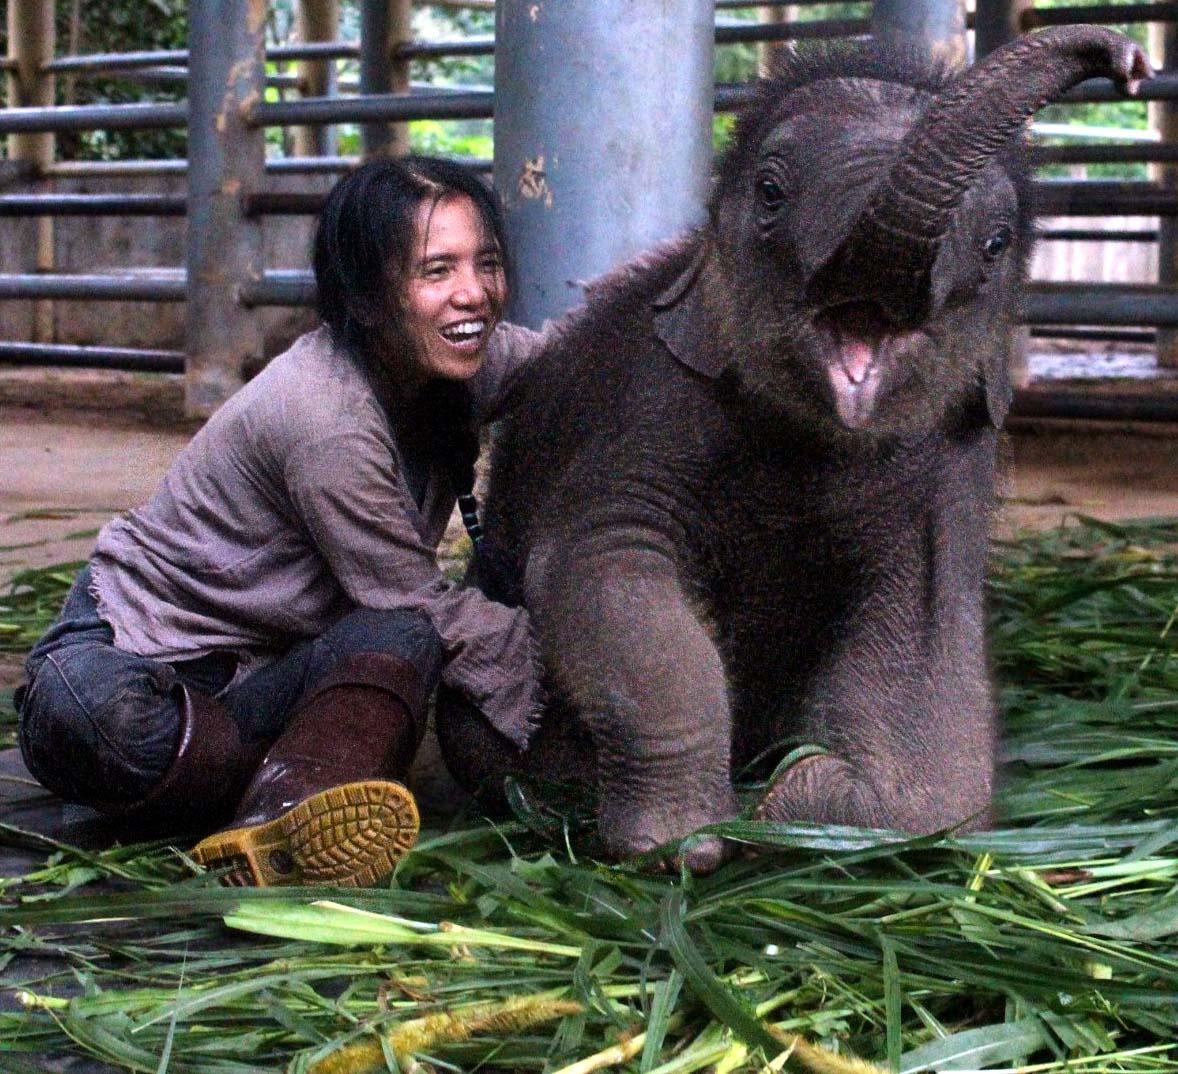 Elefanten-Baby Navann (Foto: Wikimedia Commons, Elemanxx)